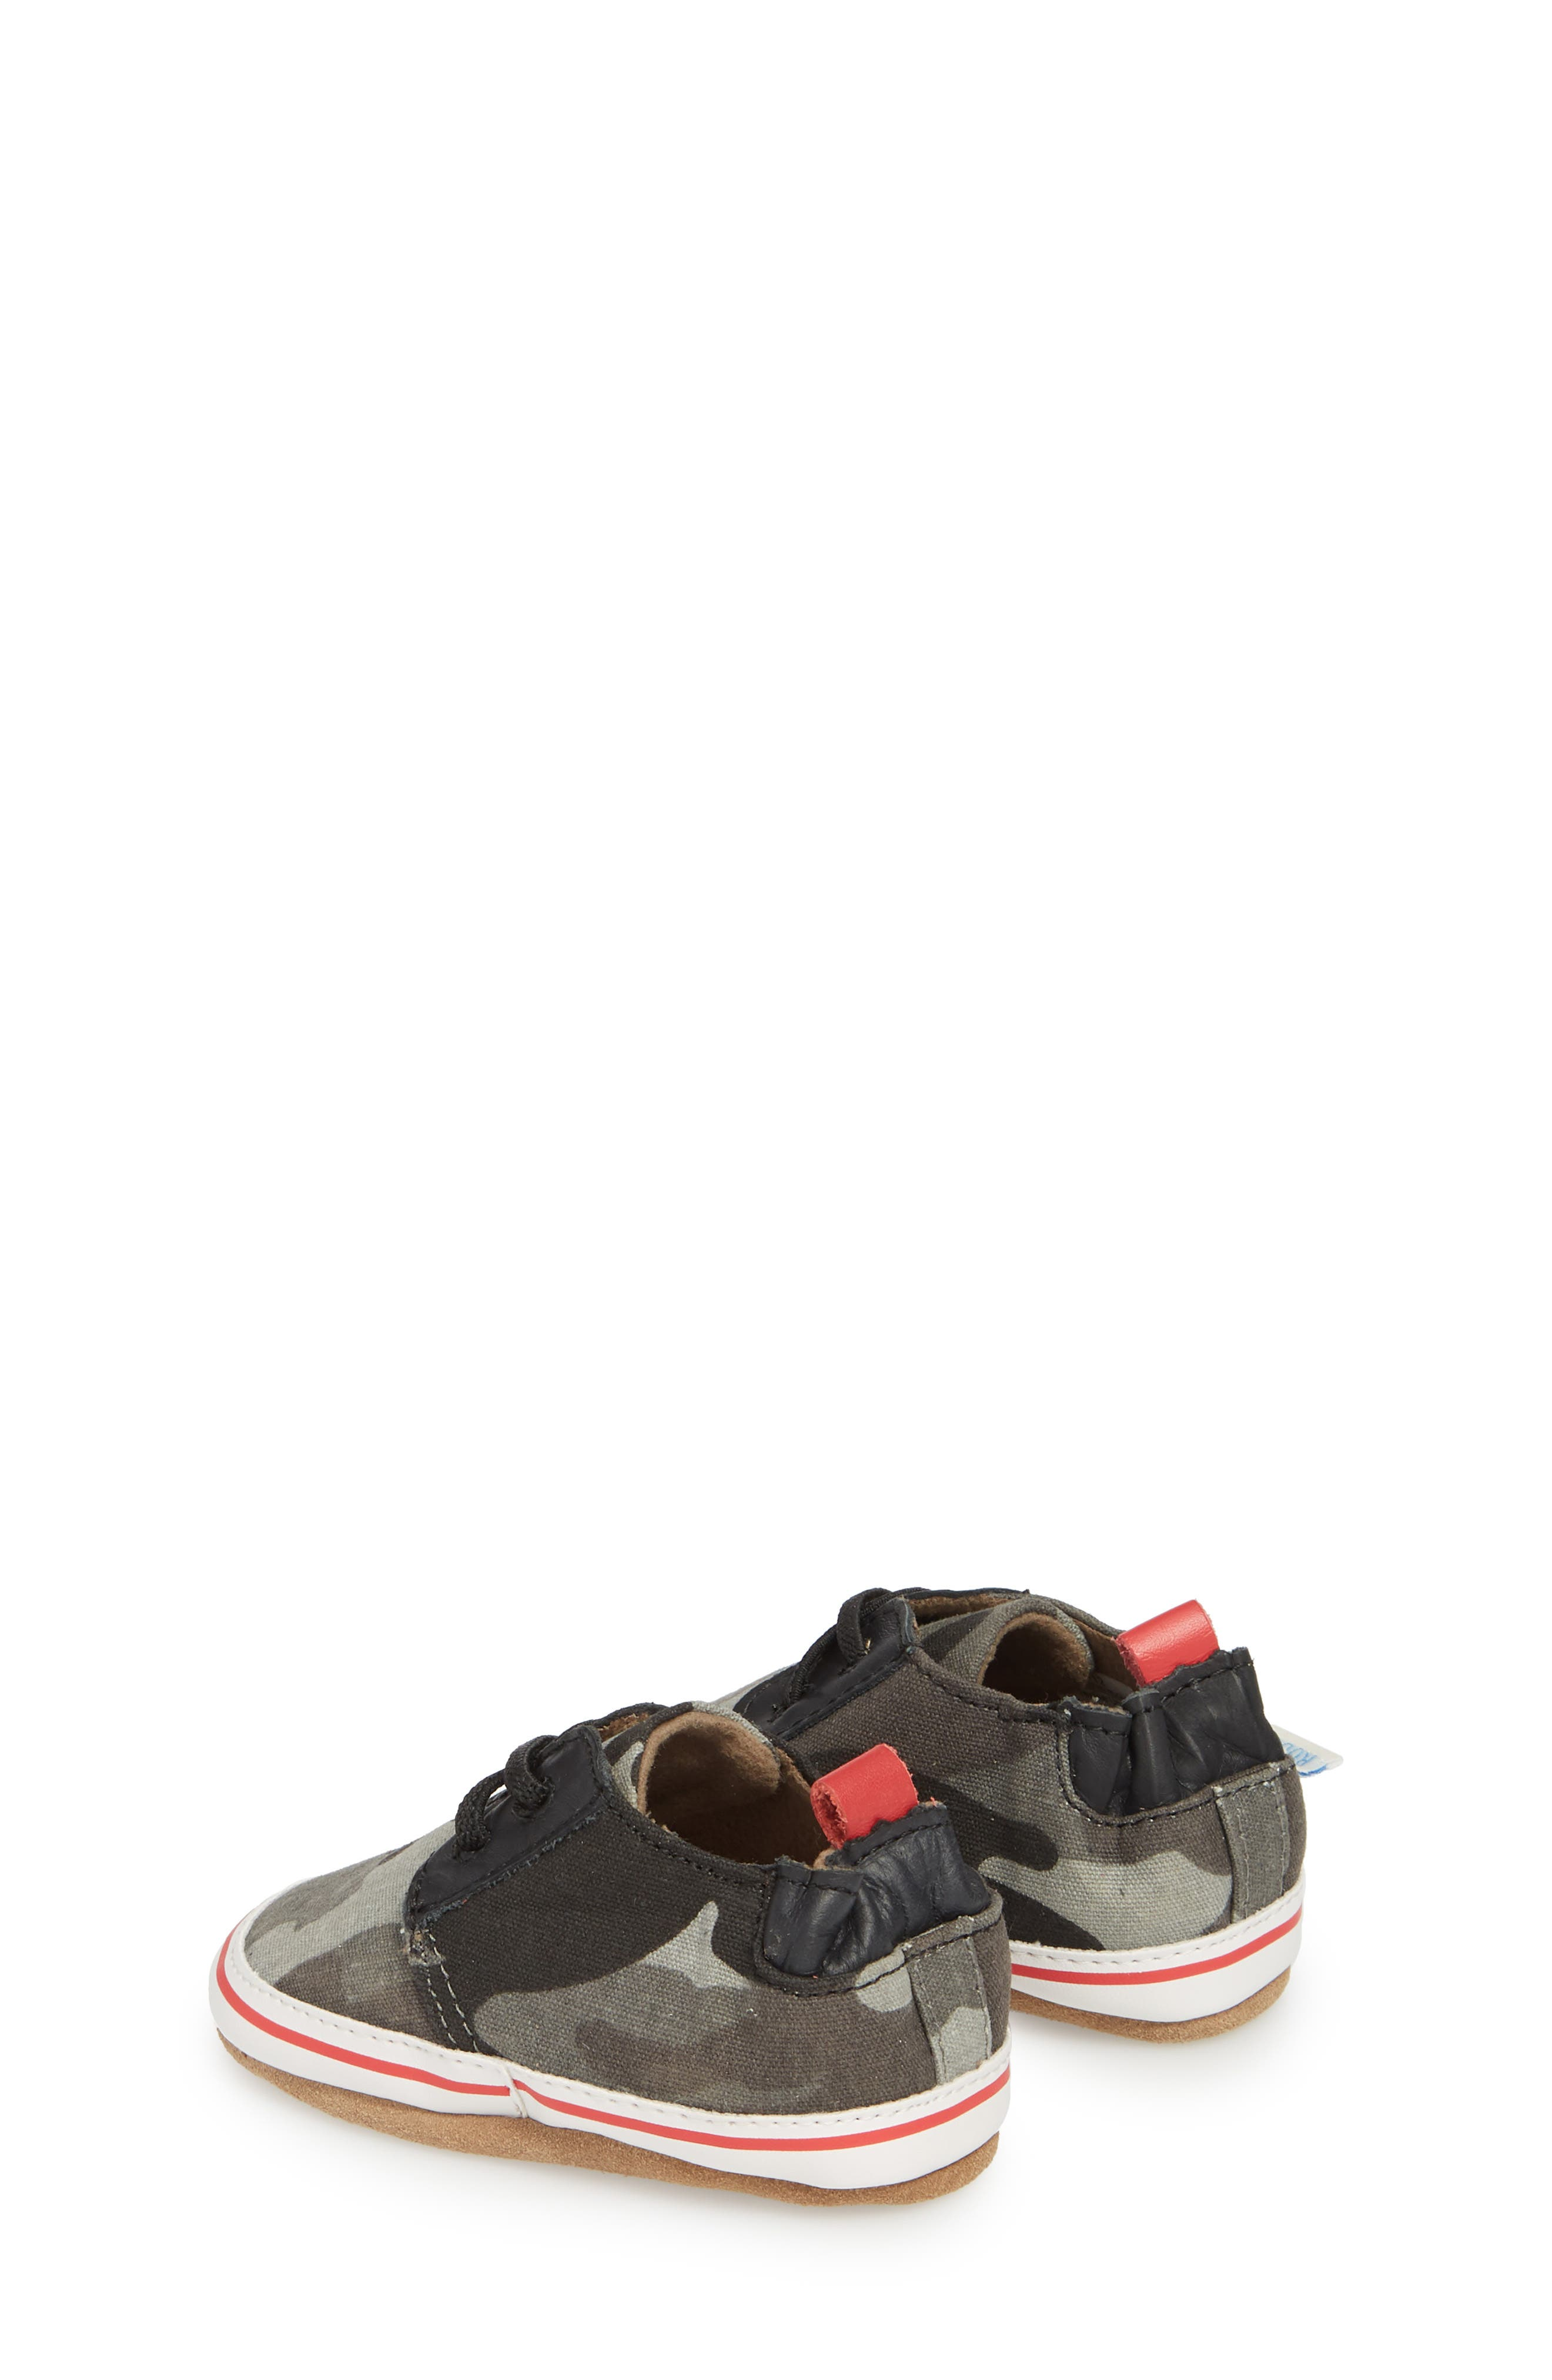 Cool & Casual Camo Print Crib Shoe,                             Alternate thumbnail 2, color,                             Grey